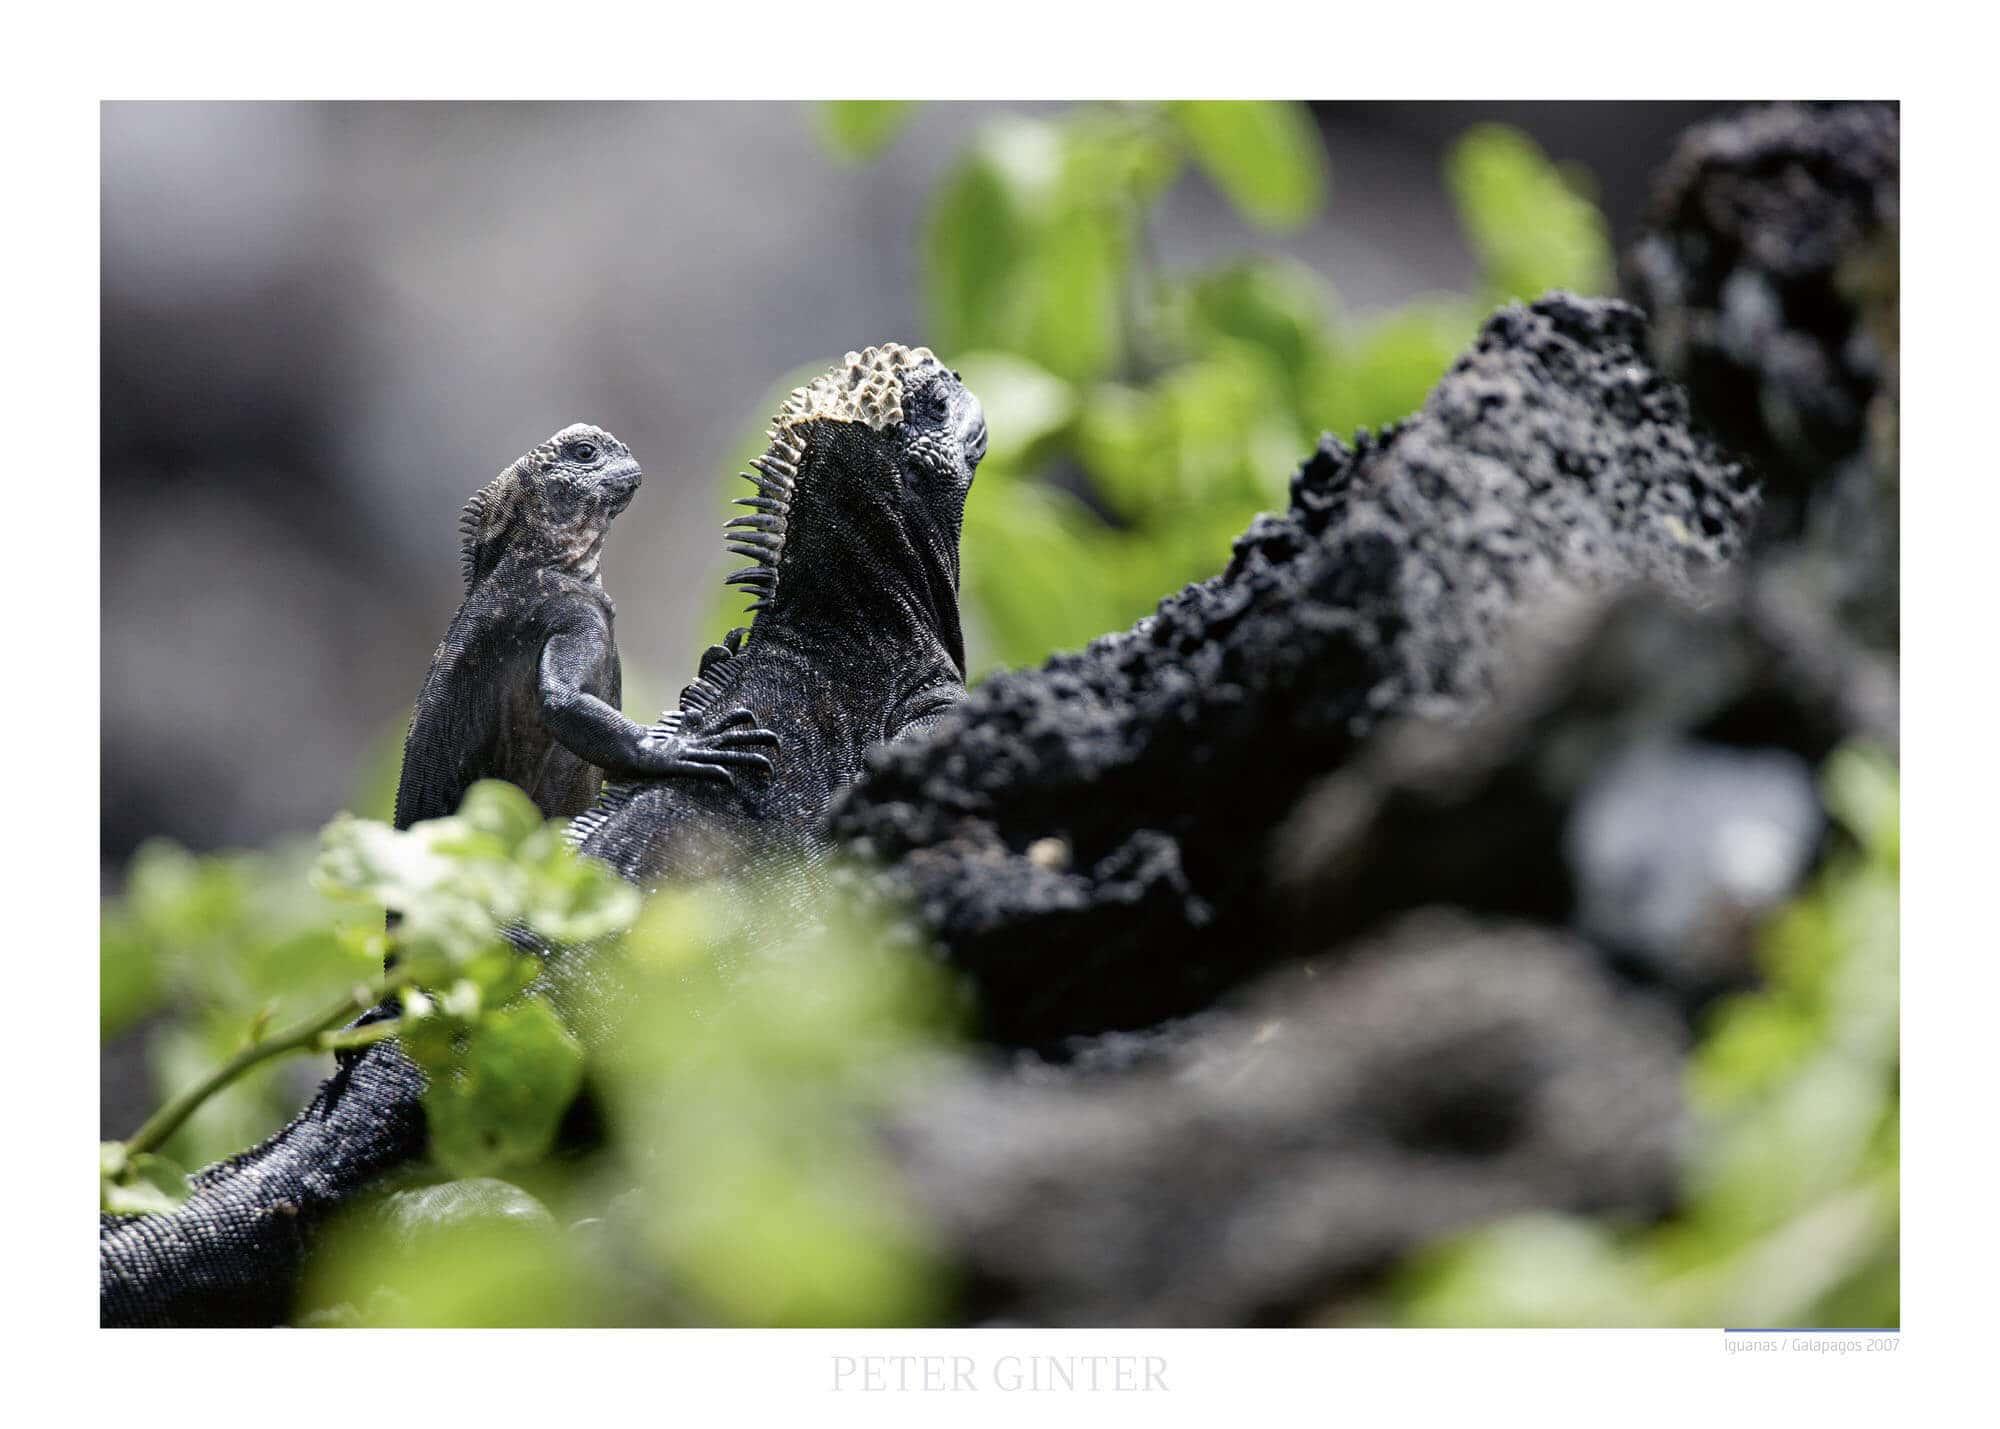 Iguanas / Galapagos 2007 © Peter Ginter